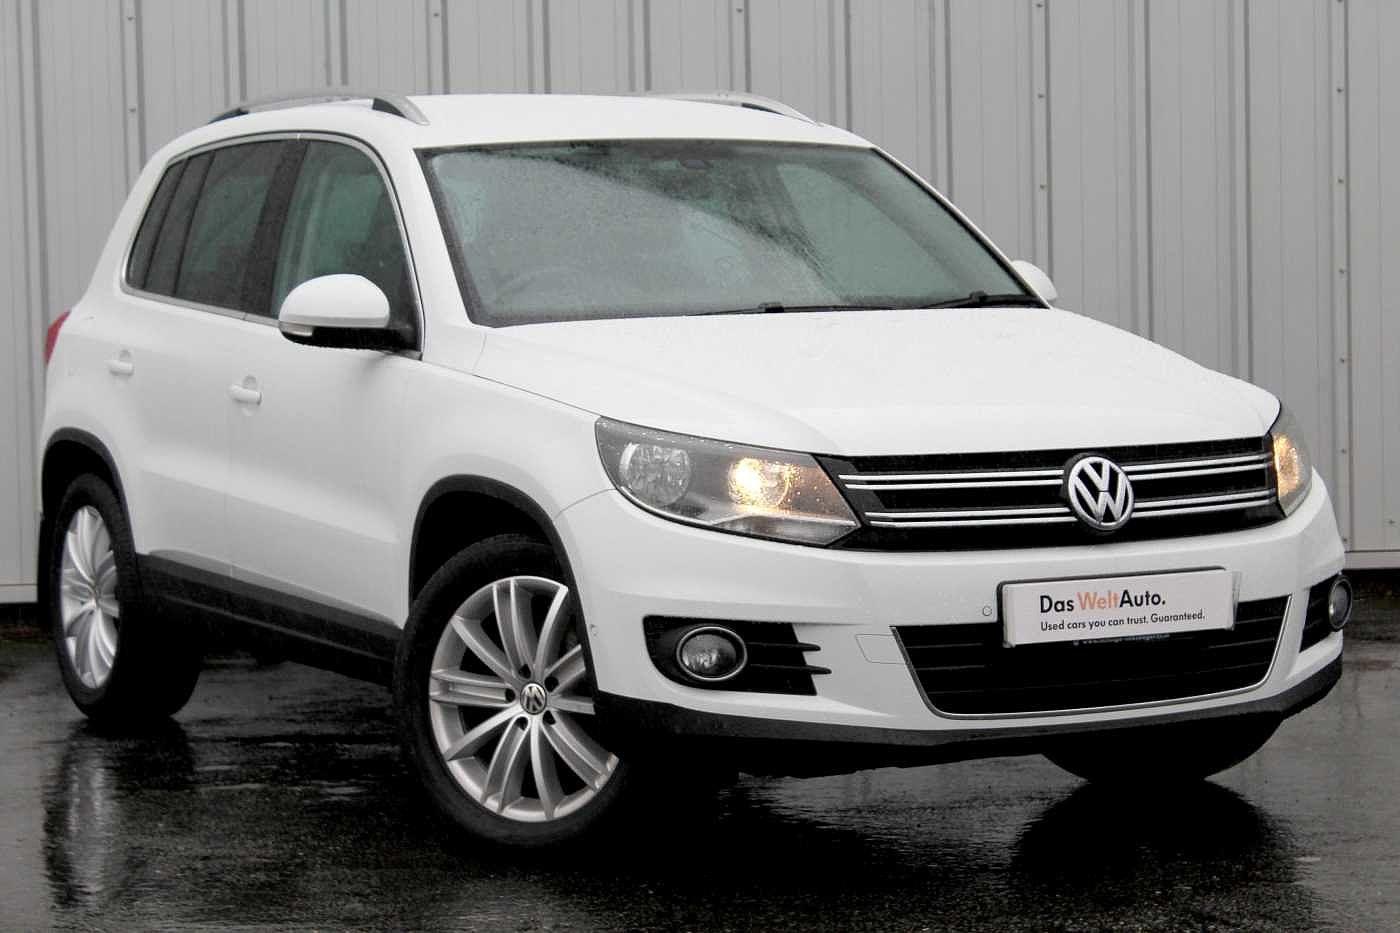 Volkswagen Tiguan 2.0TDI (150PS) Match BlueMotion 2WD SCR